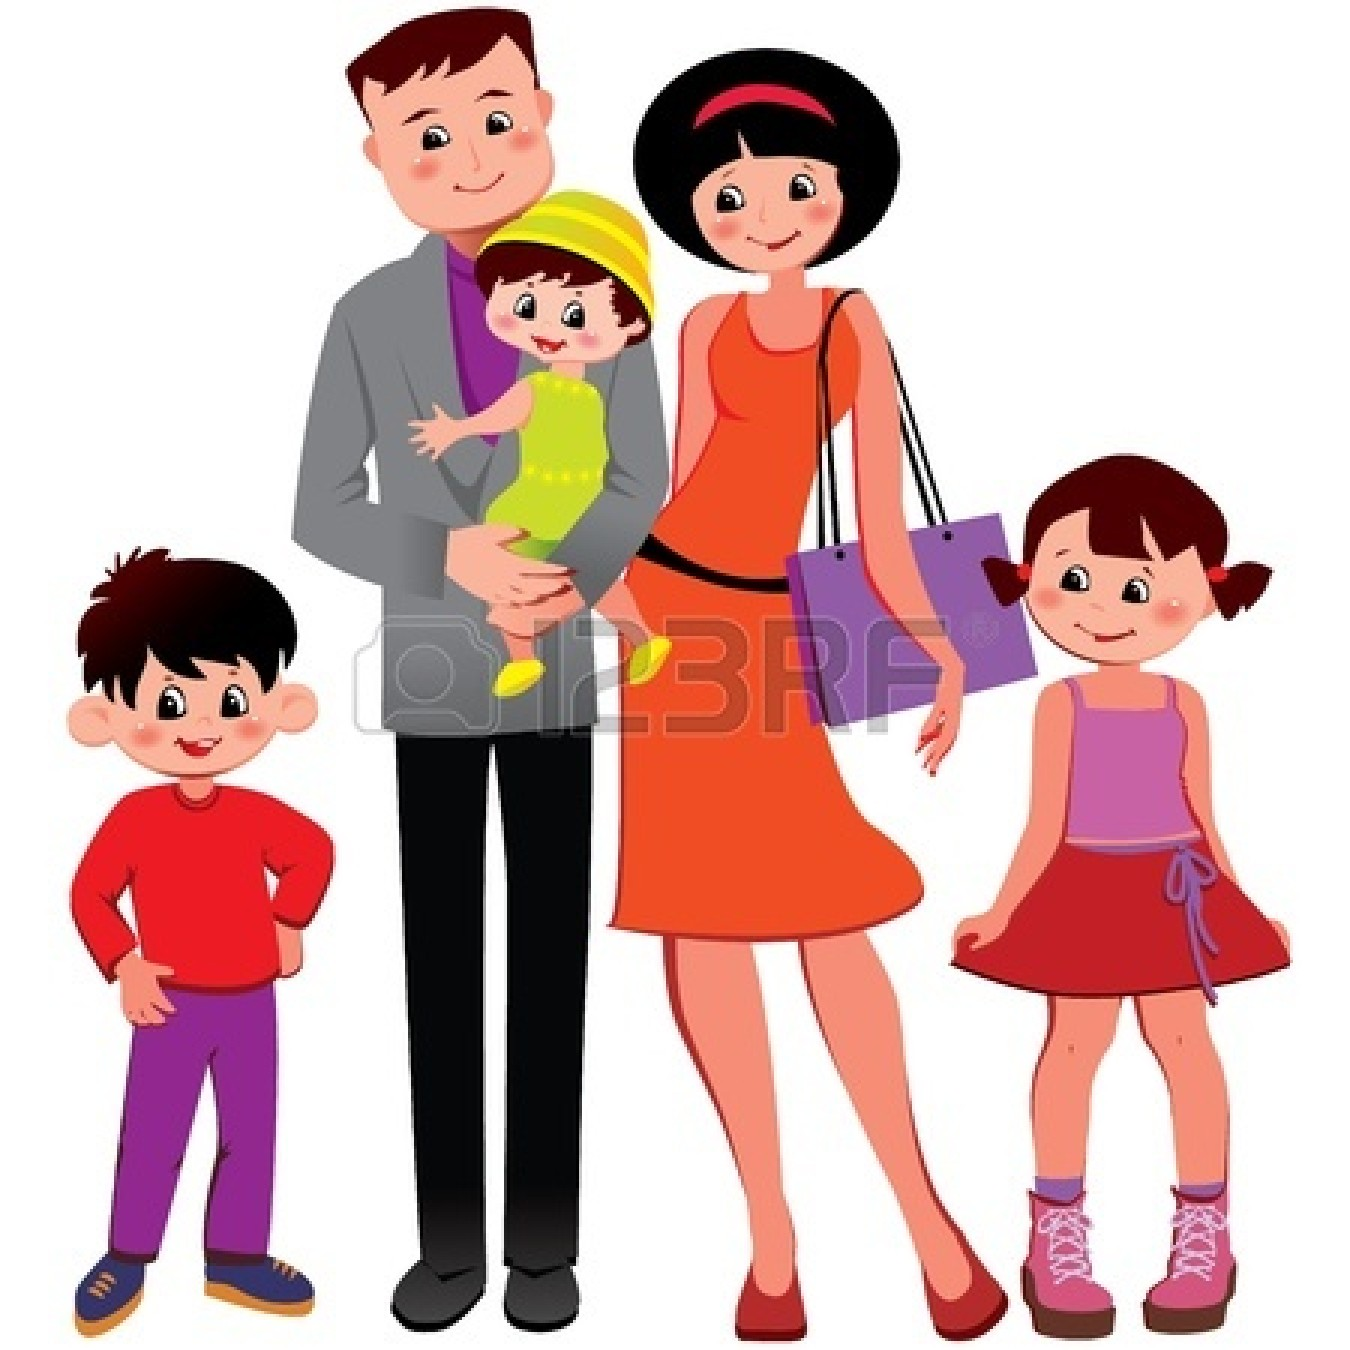 Images of families clipart graphic transparent 61+ Families Clipart | ClipartLook graphic transparent